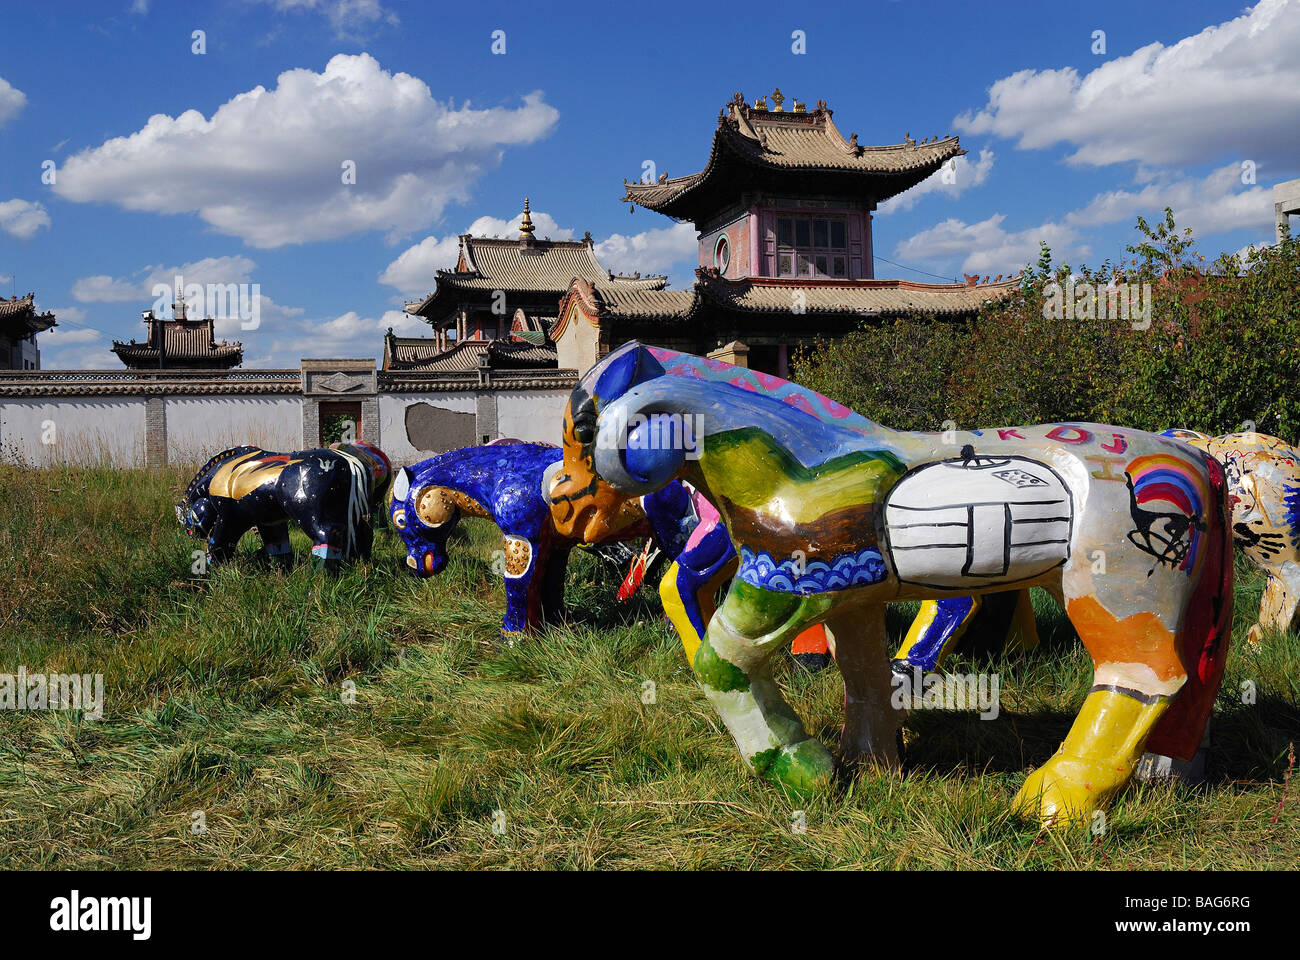 Mongolia, Ulanbaatar, Monastery-Museum of Choijin Lama, fancy horse sculptures - Stock Image